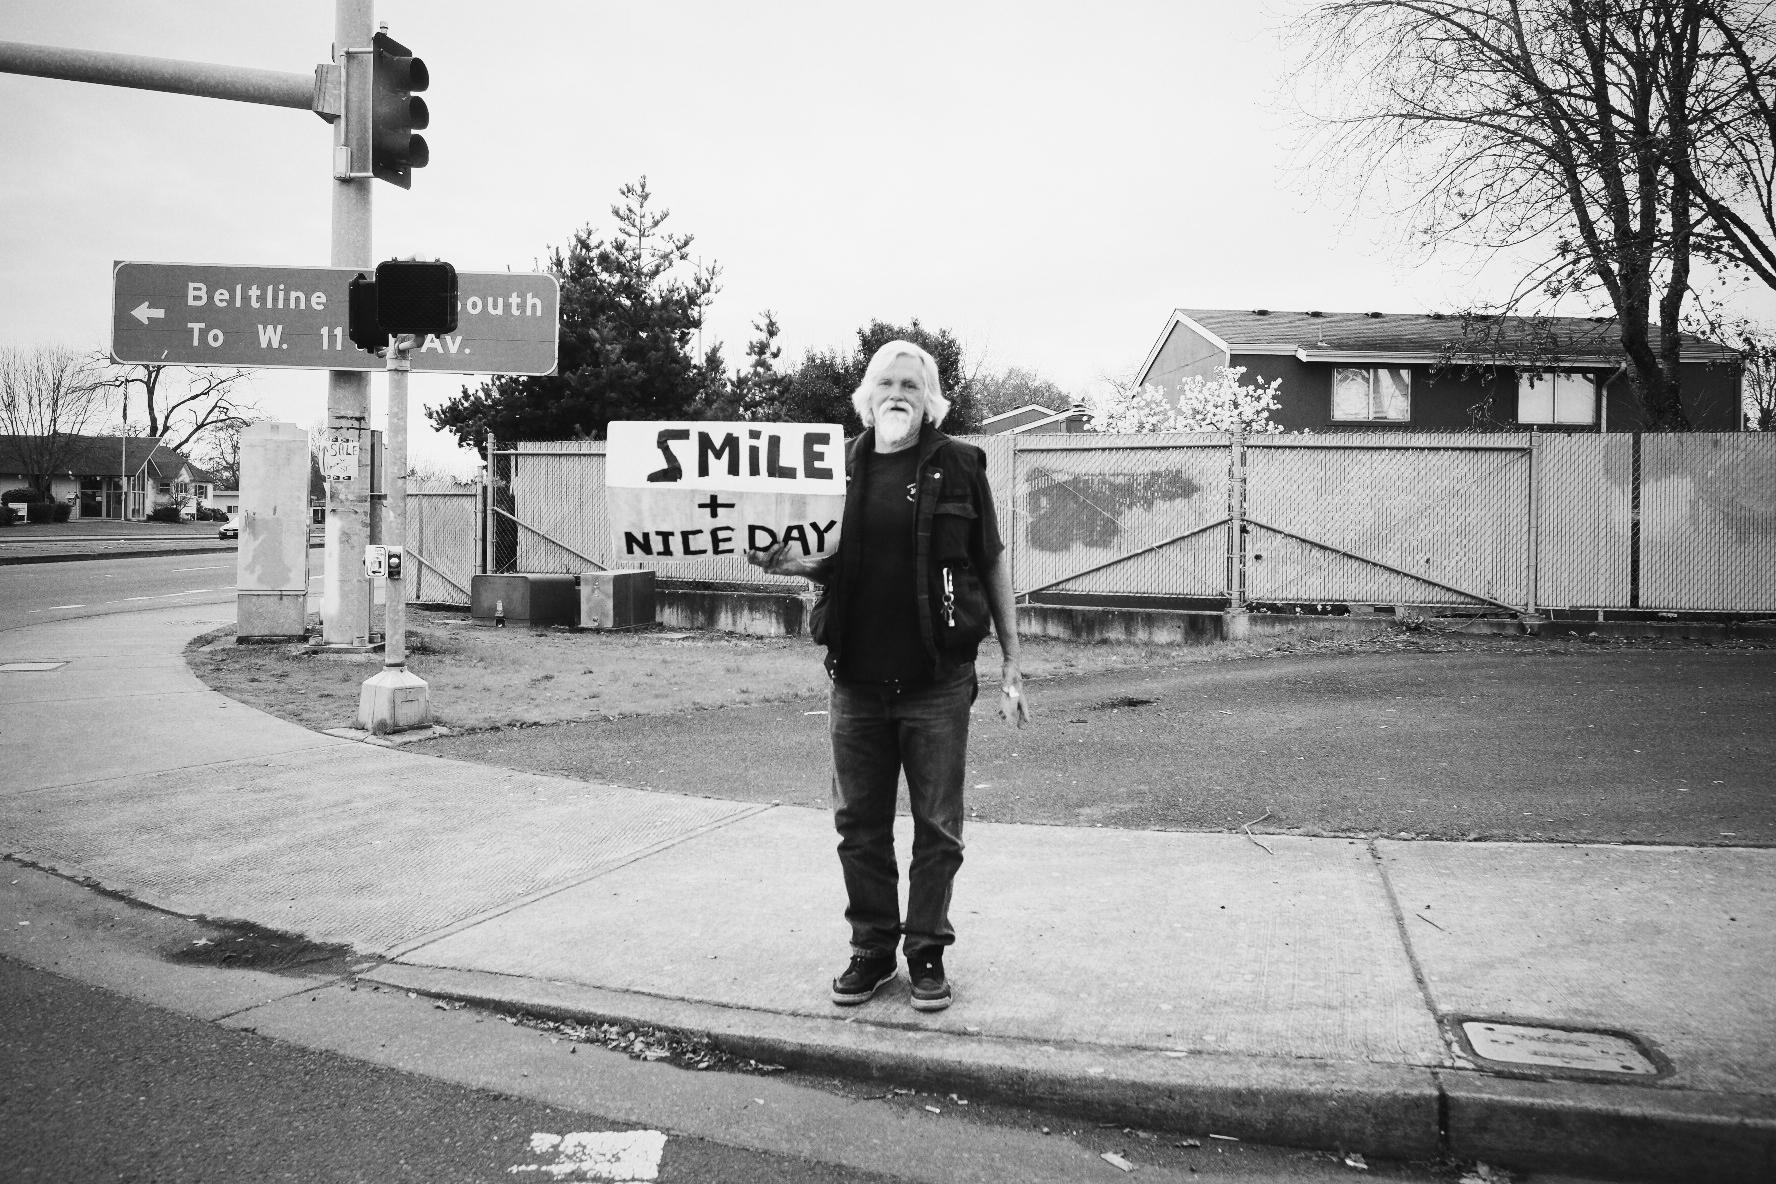 58. Smile